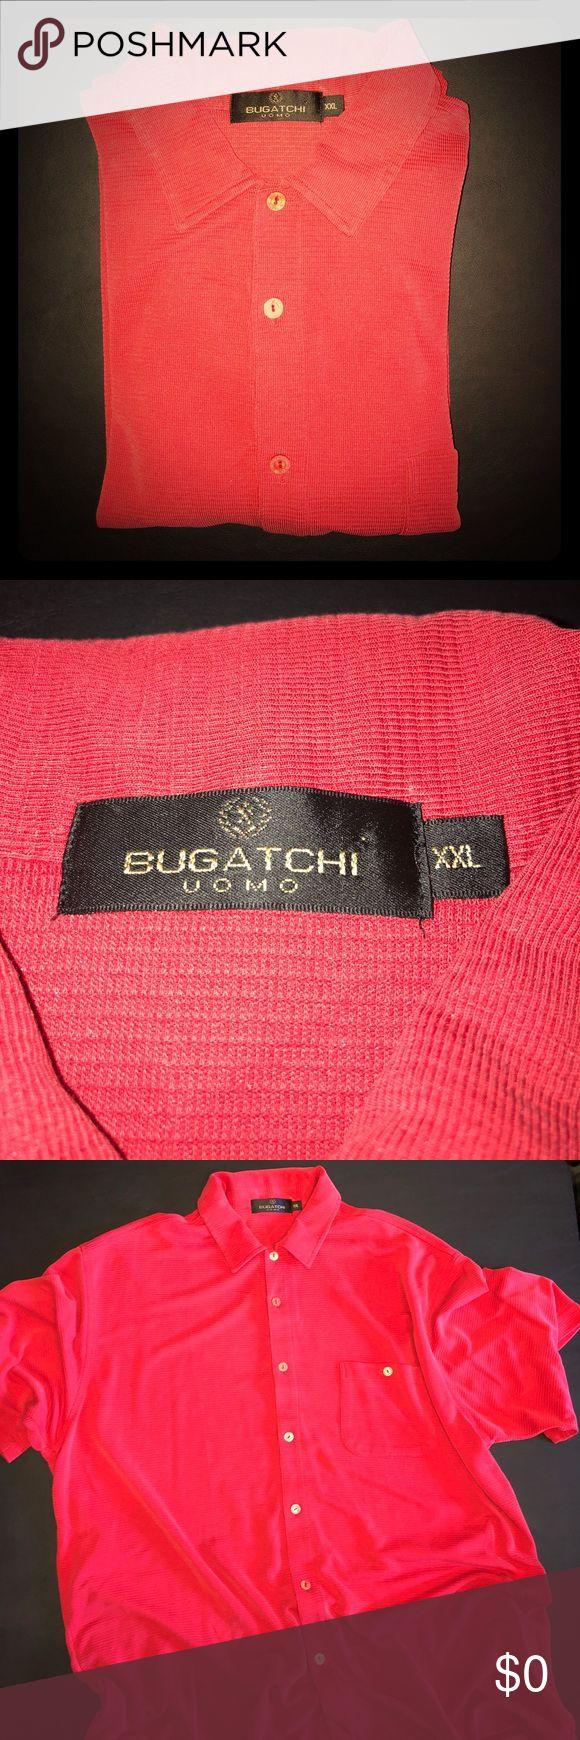 Red Bugatchi shirt NWOT Beautiful Bugatchi shirt that is very soft made with 65% Modal Rayon and 35% Polyester NWOT. Bugatchi Shirts Casual Button Down Shirts